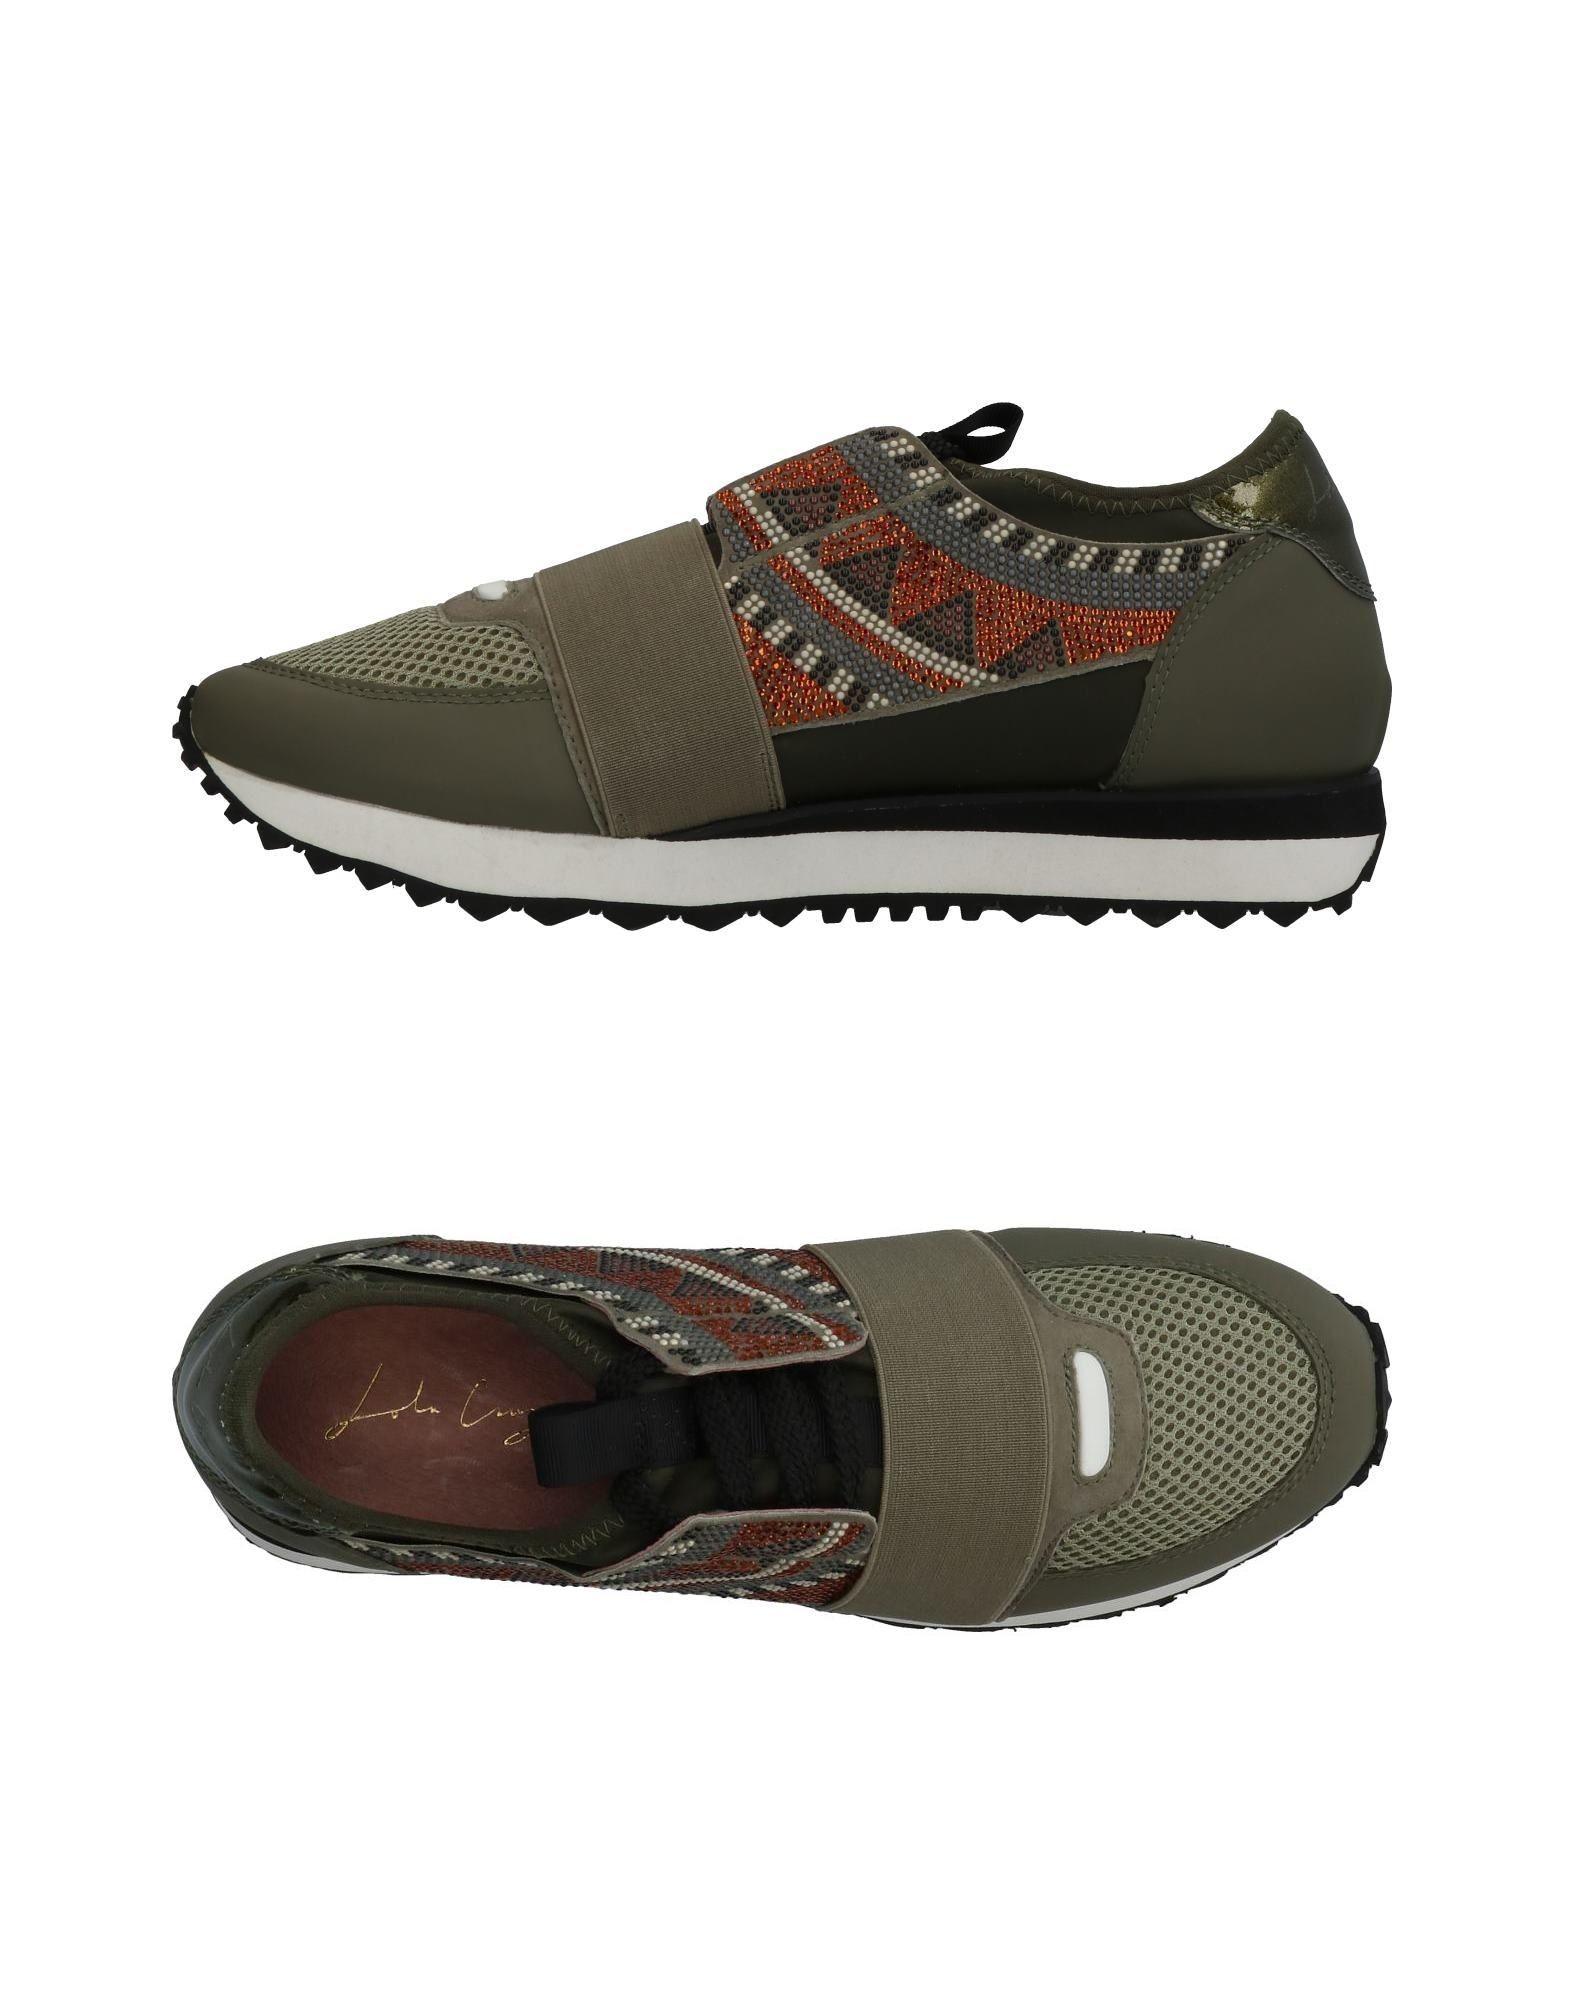 Sneakers Lola Cruz Donna - Acquista online su